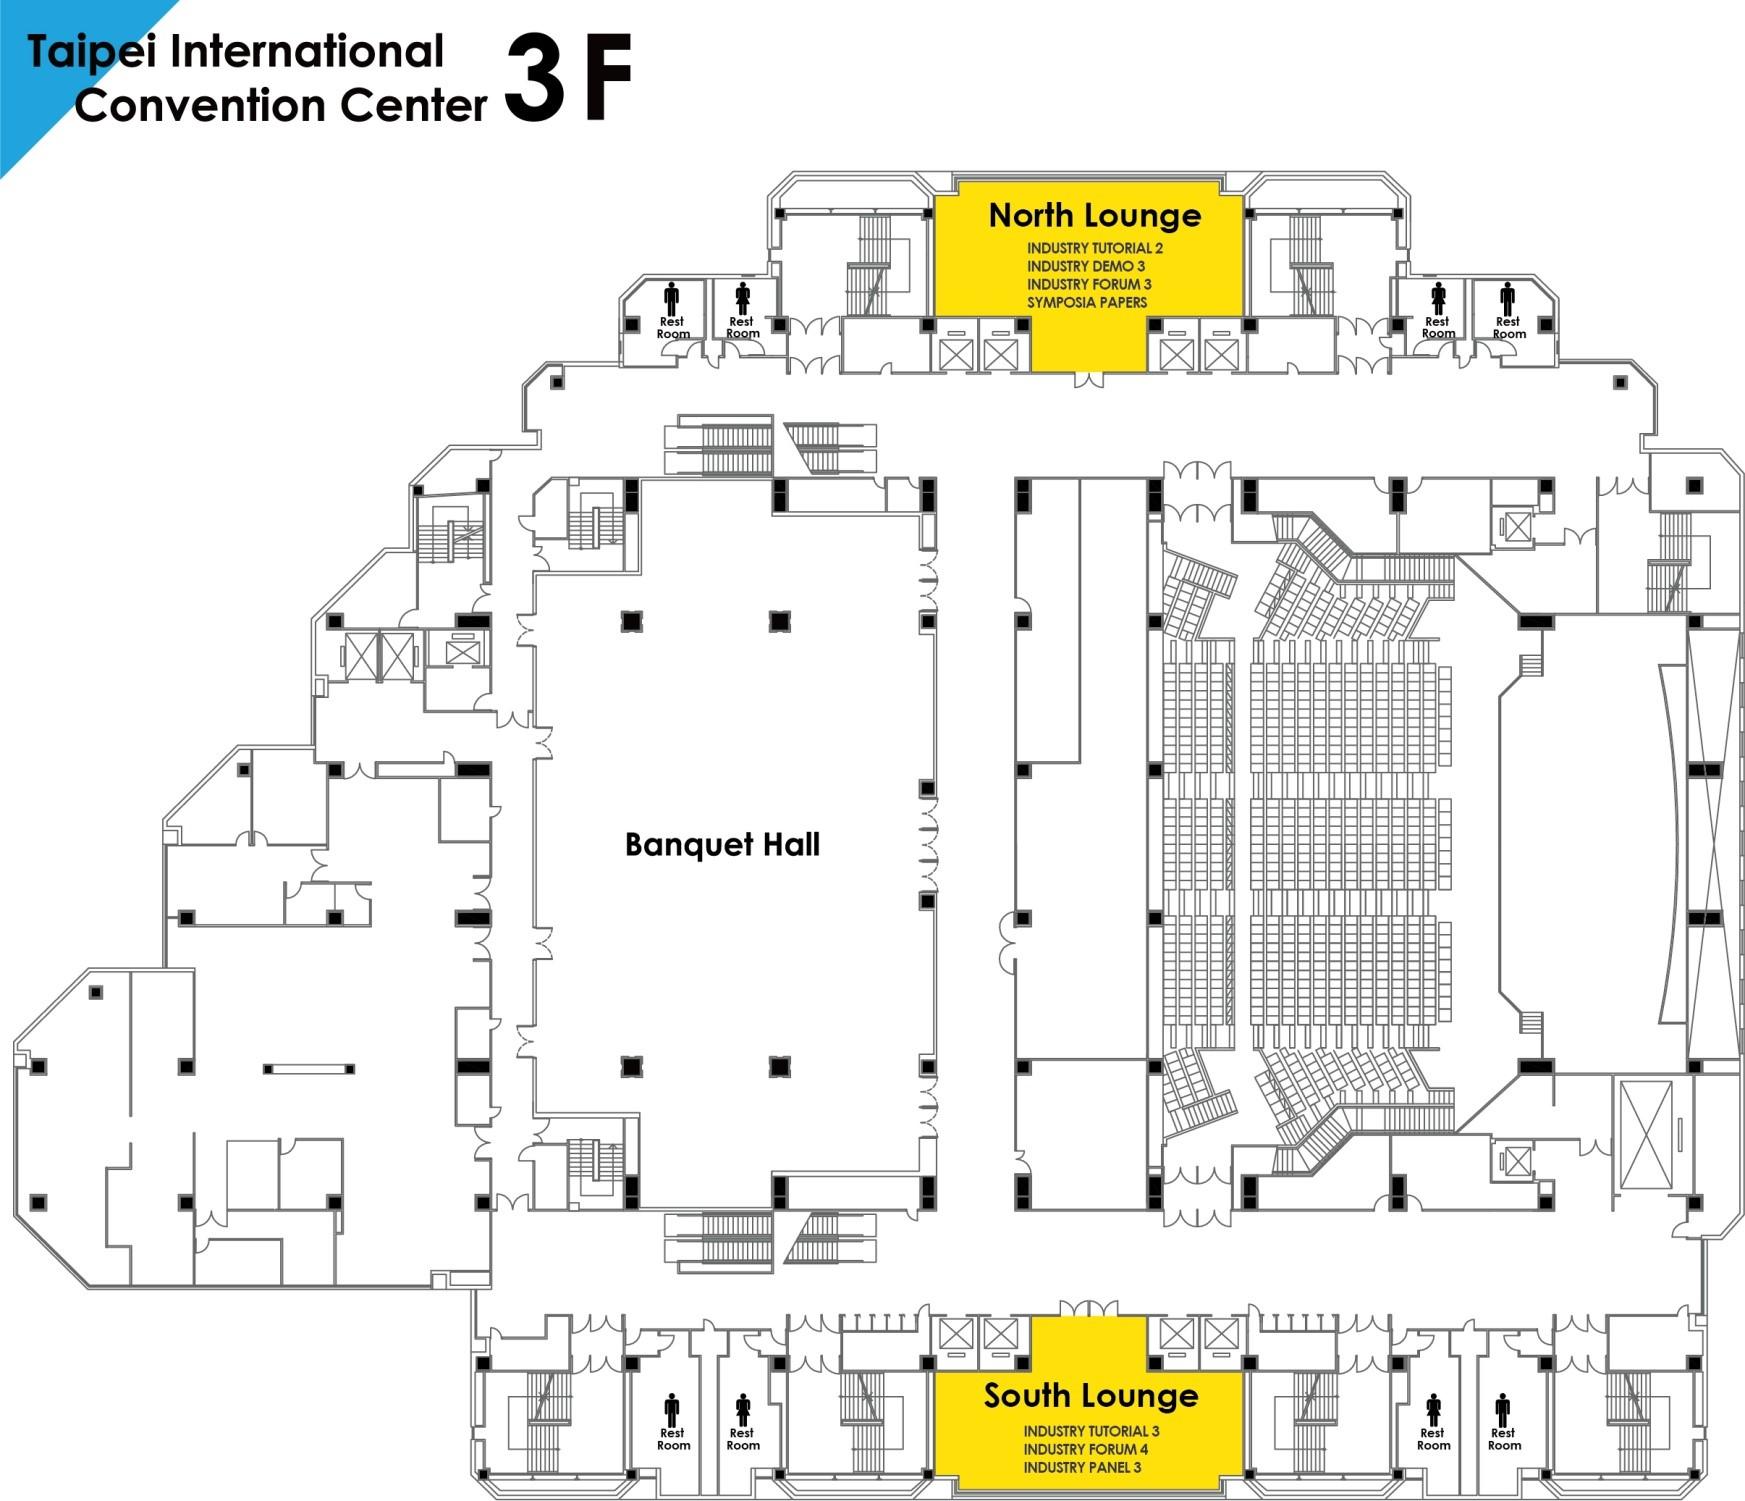 TICC Venue Floor Map 3F